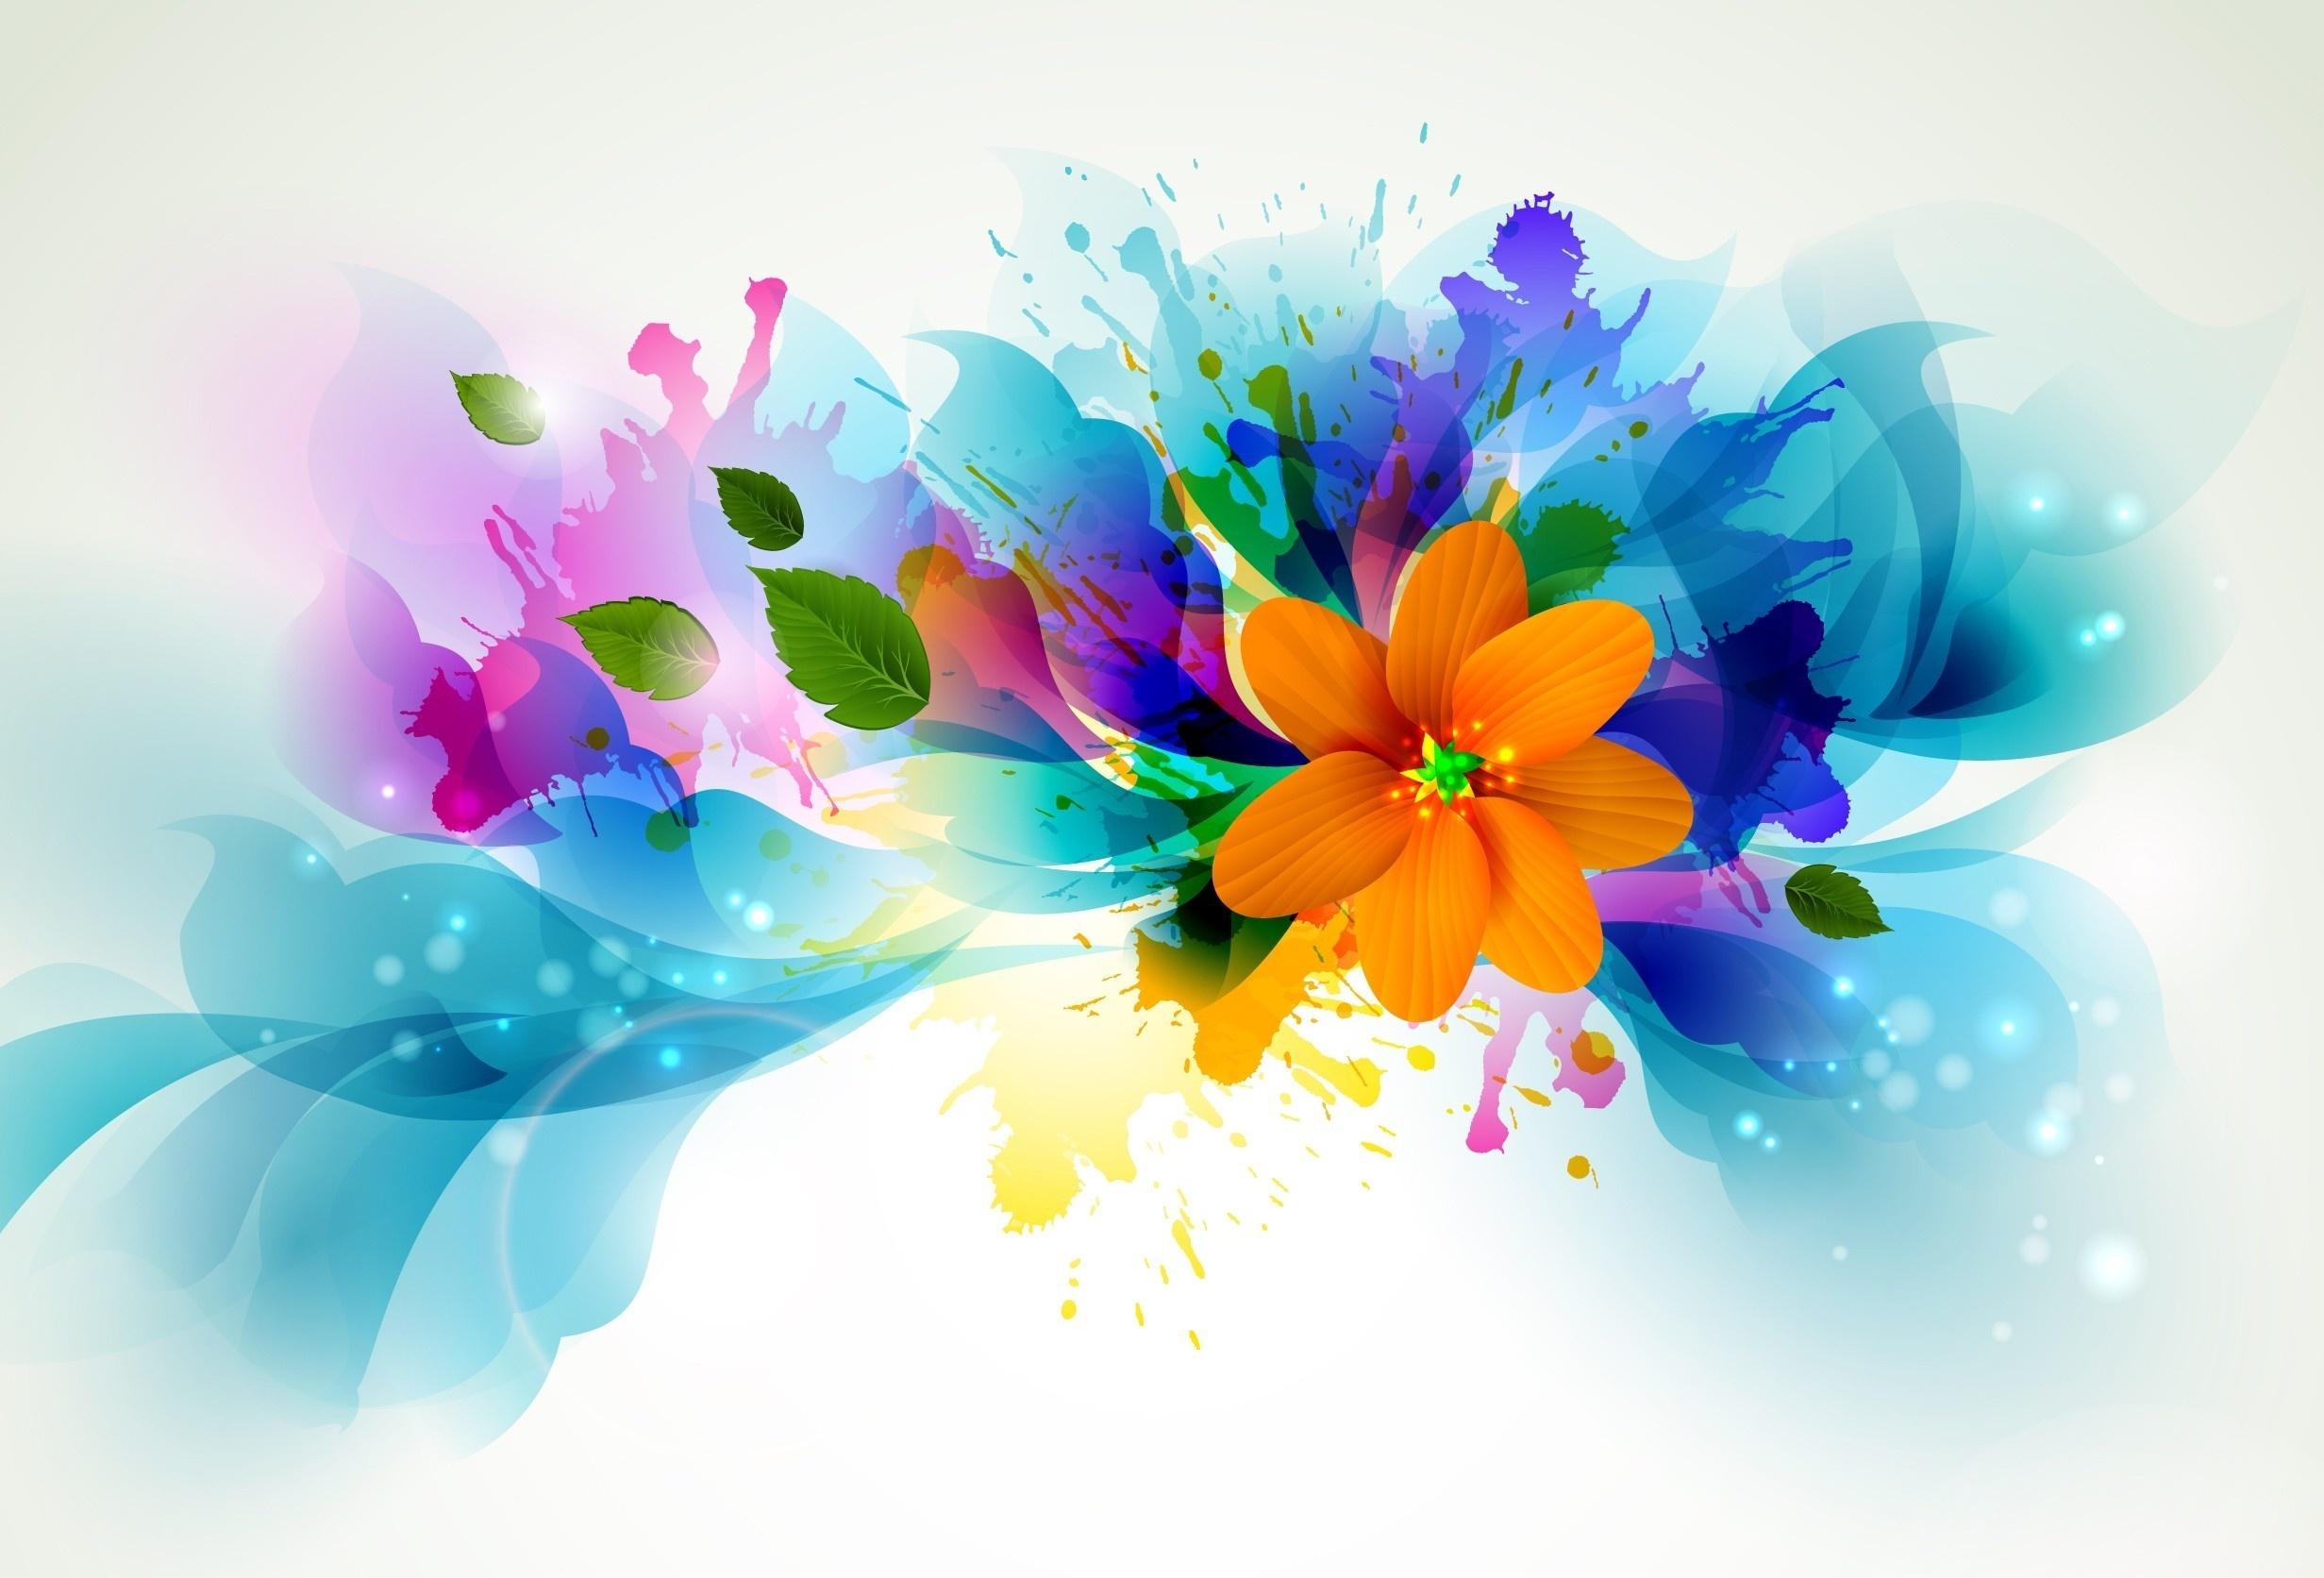 colorful-abstract-flowers-1920x1080-Widescreen-High-Resolution-1080p-HD-Desktop-Wallpaper